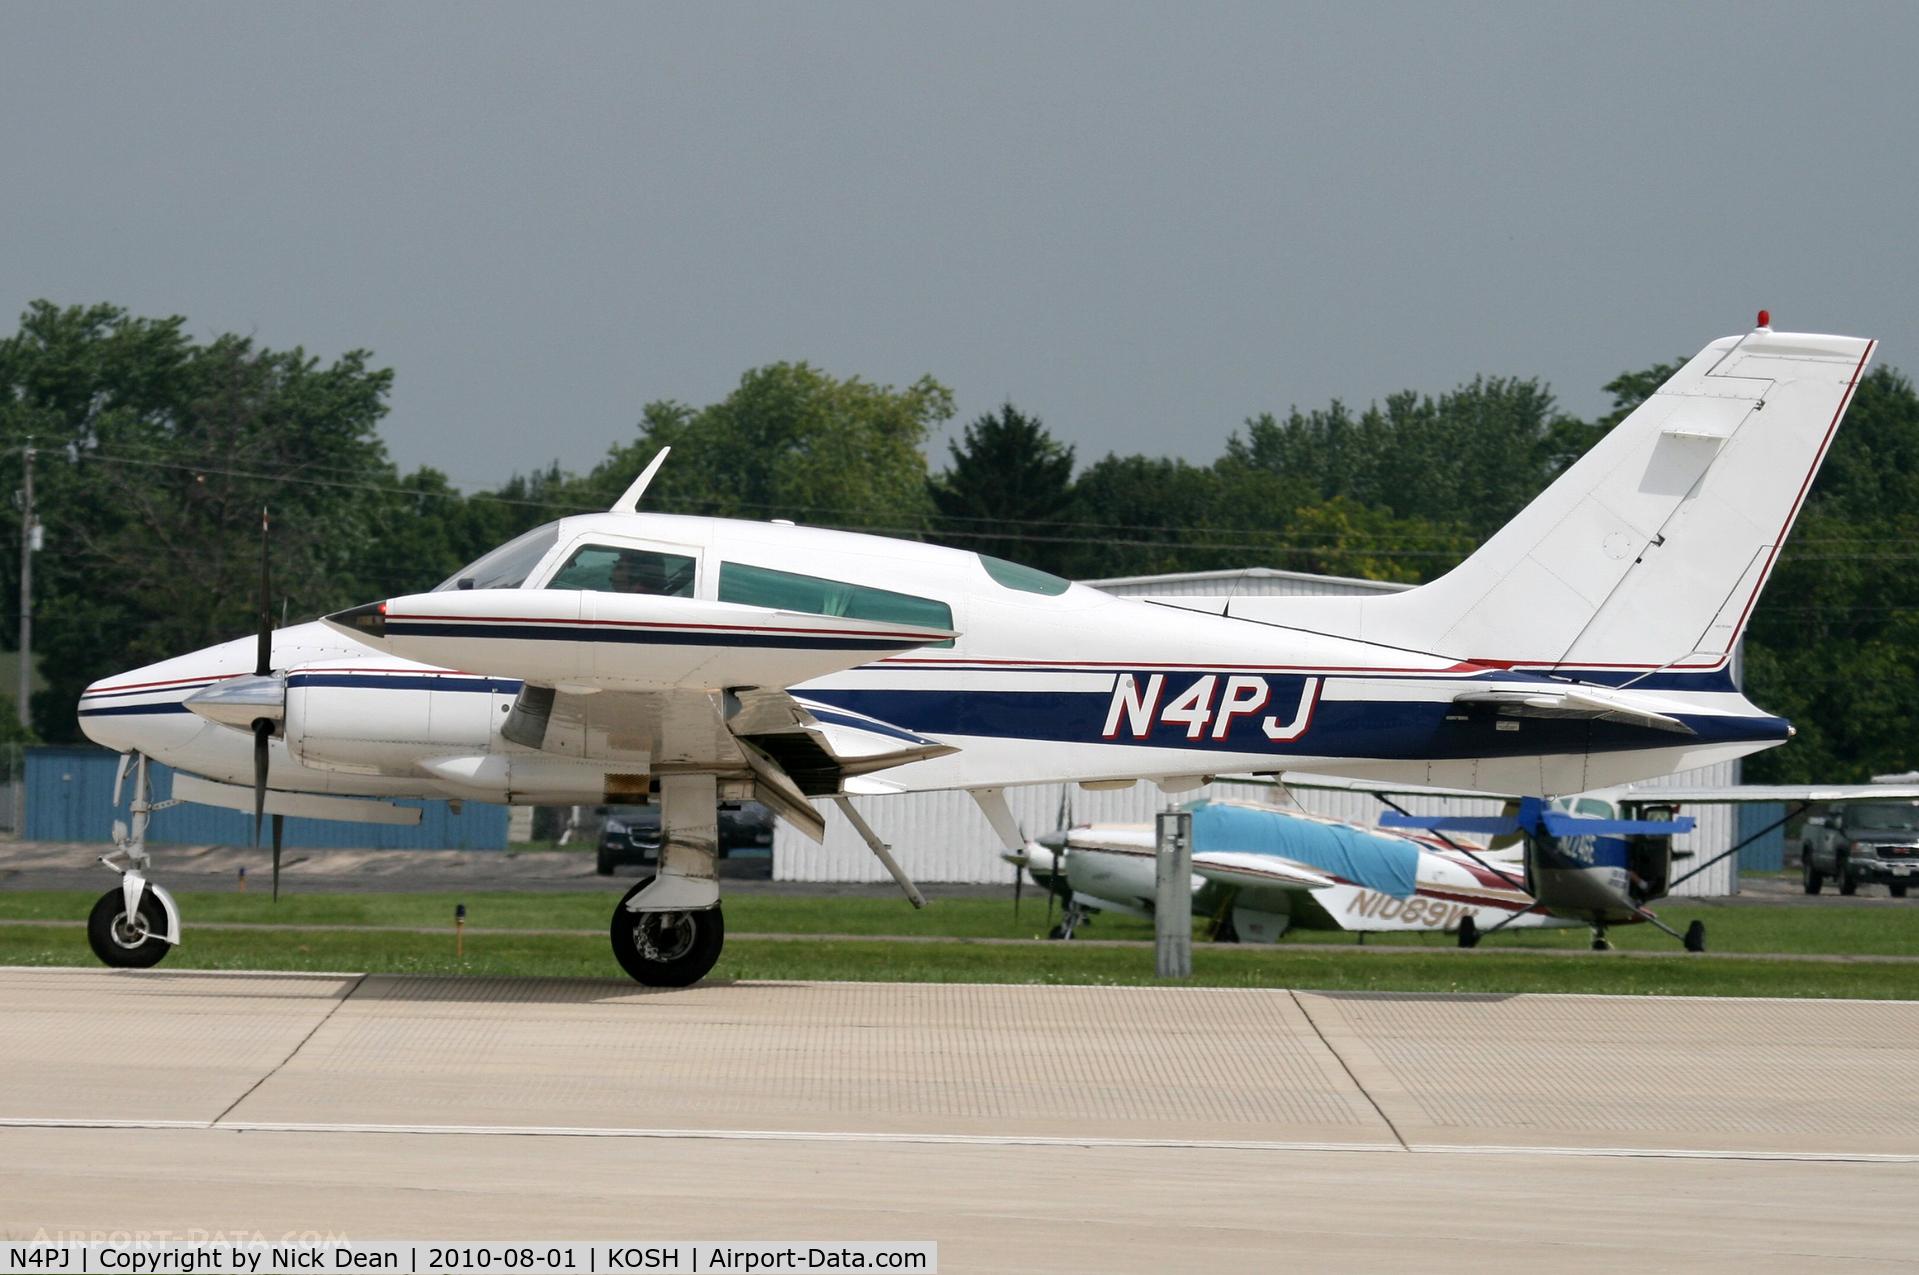 N4PJ, 1972 Cessna 310Q C/N 310Q-0515, KOSH